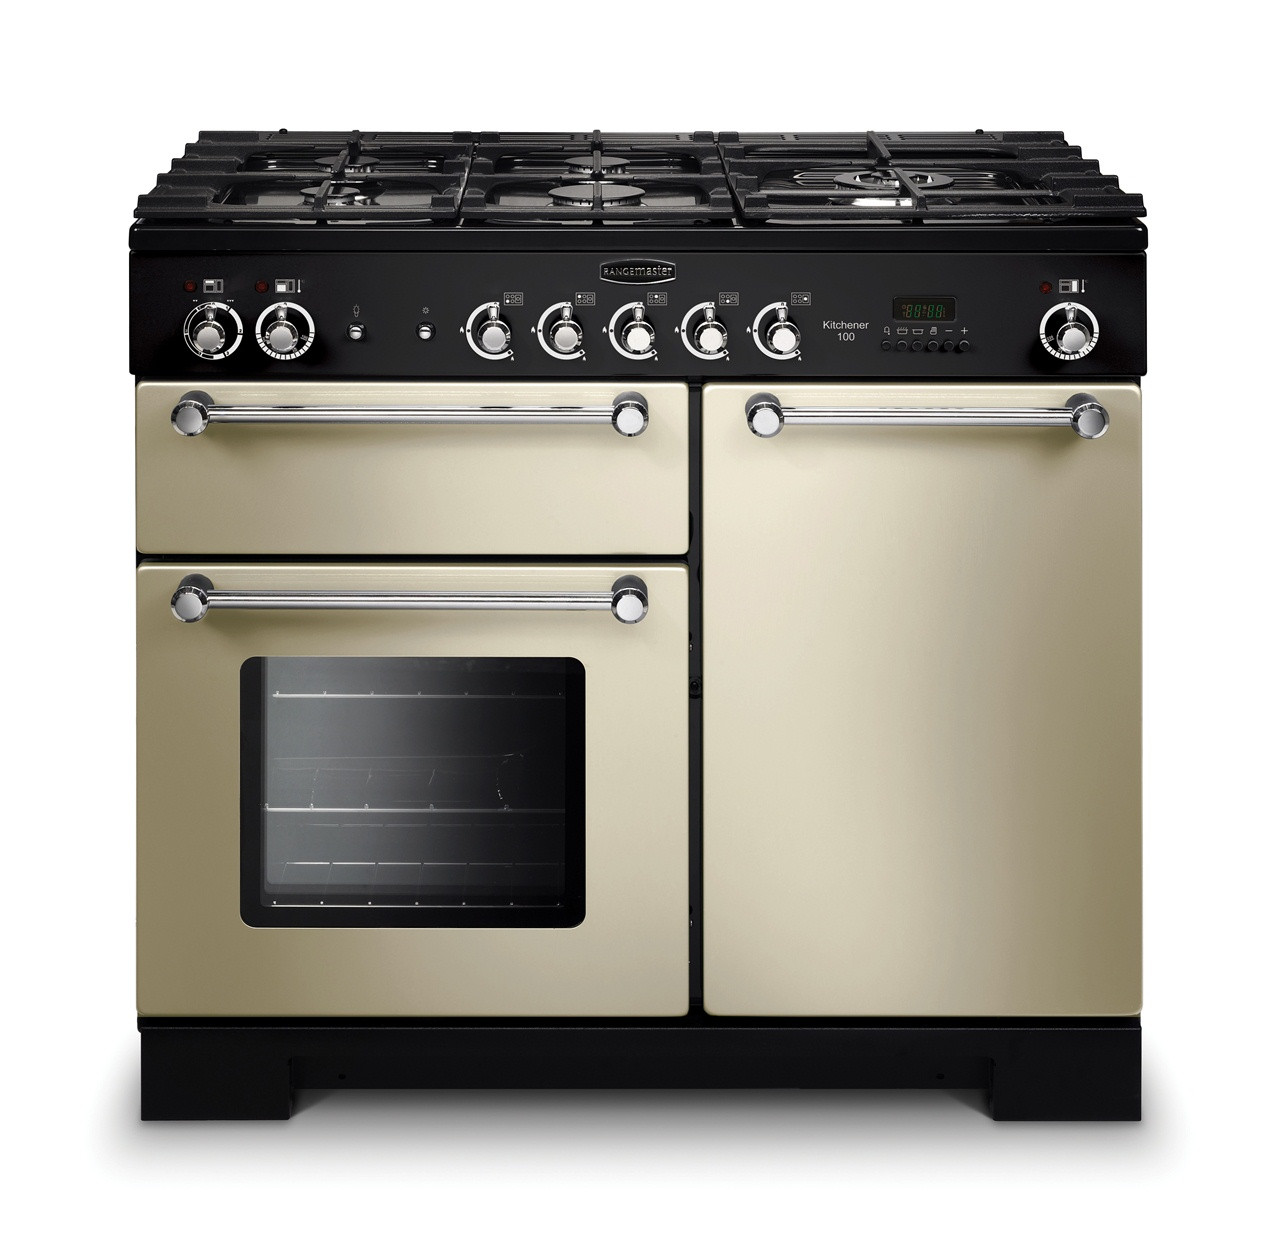 Rangemaster Kitchener 100 Dual Fuel Cream Range Cooker 98800